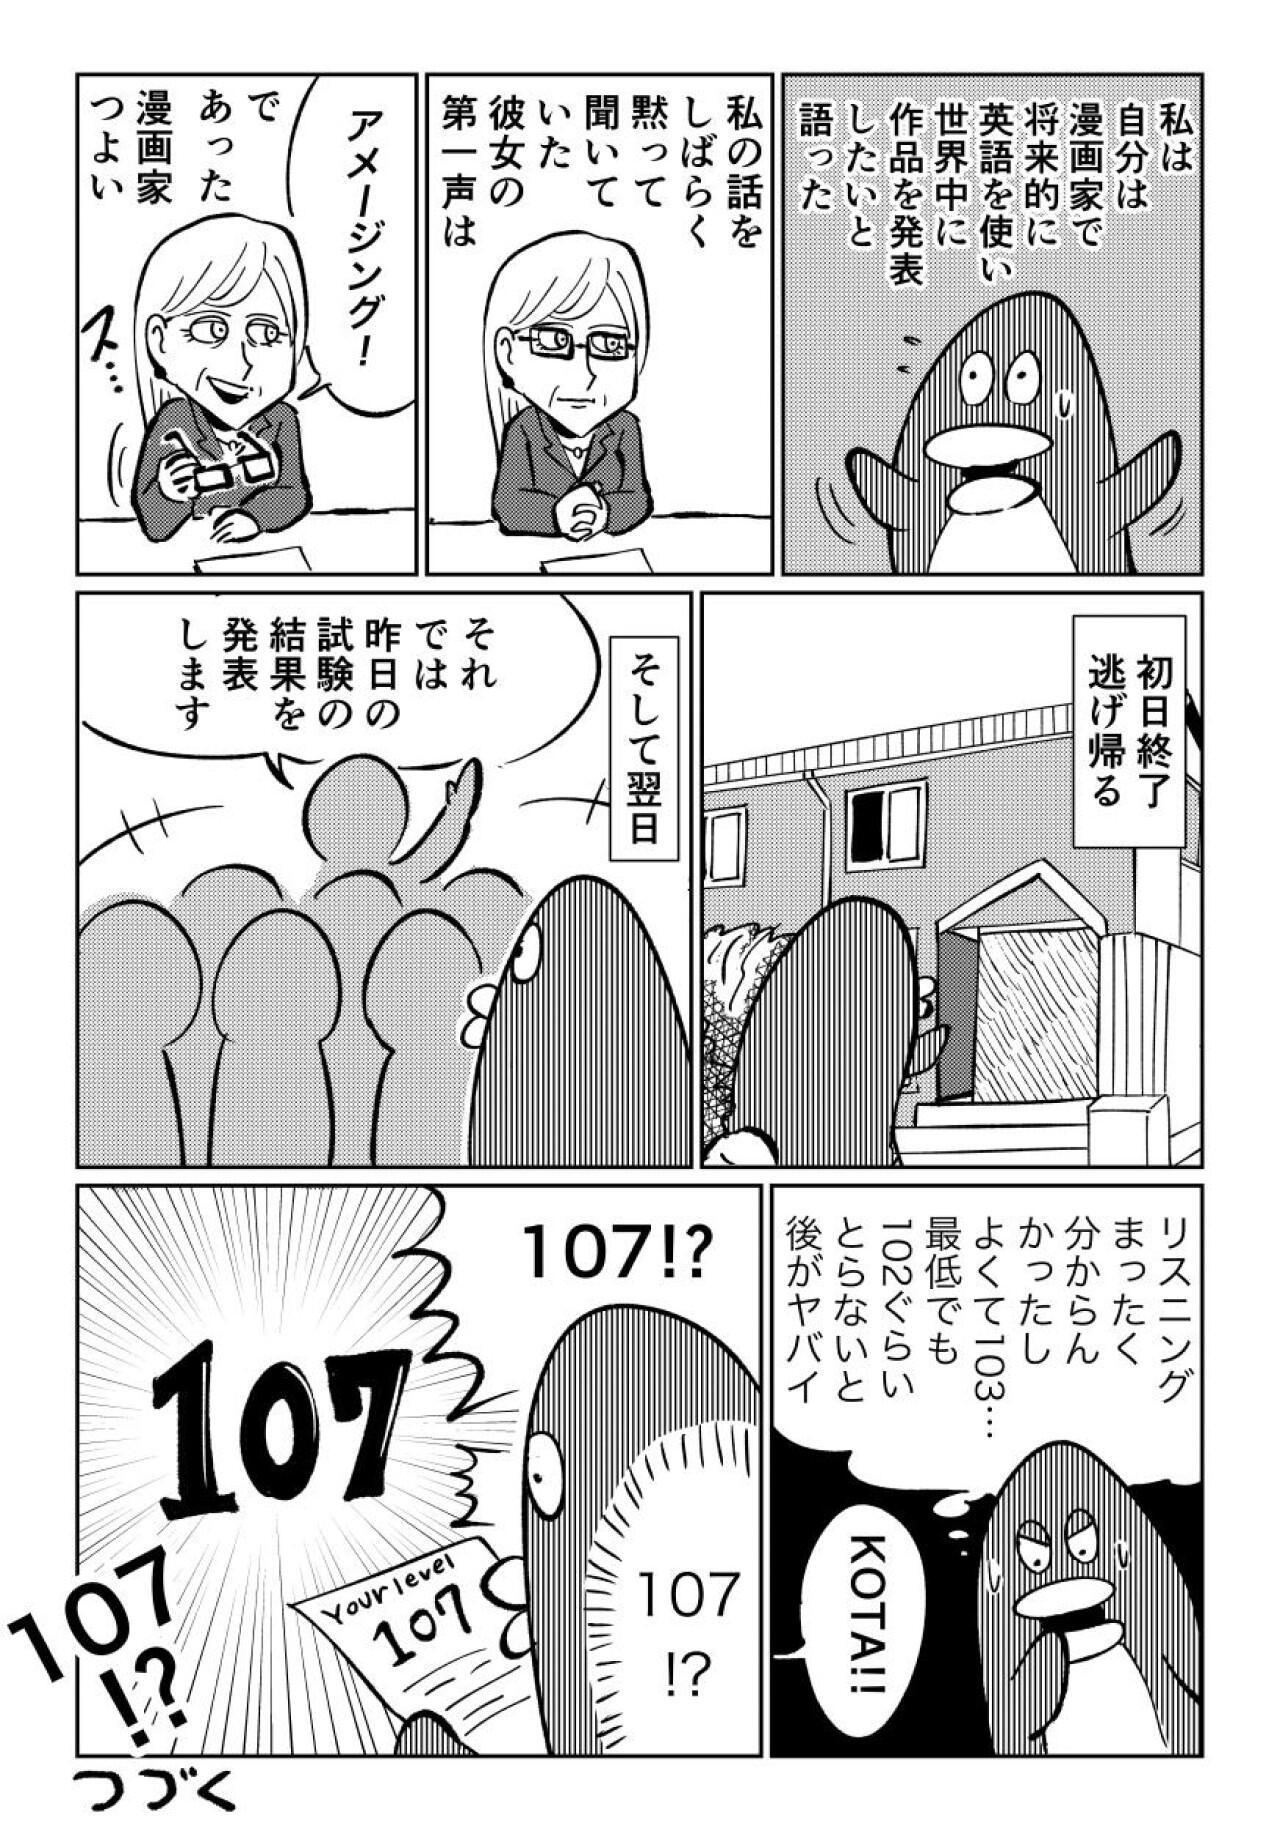 https://www.ryugaku.co.jp/column/images/34sai5_4_1280.jpg